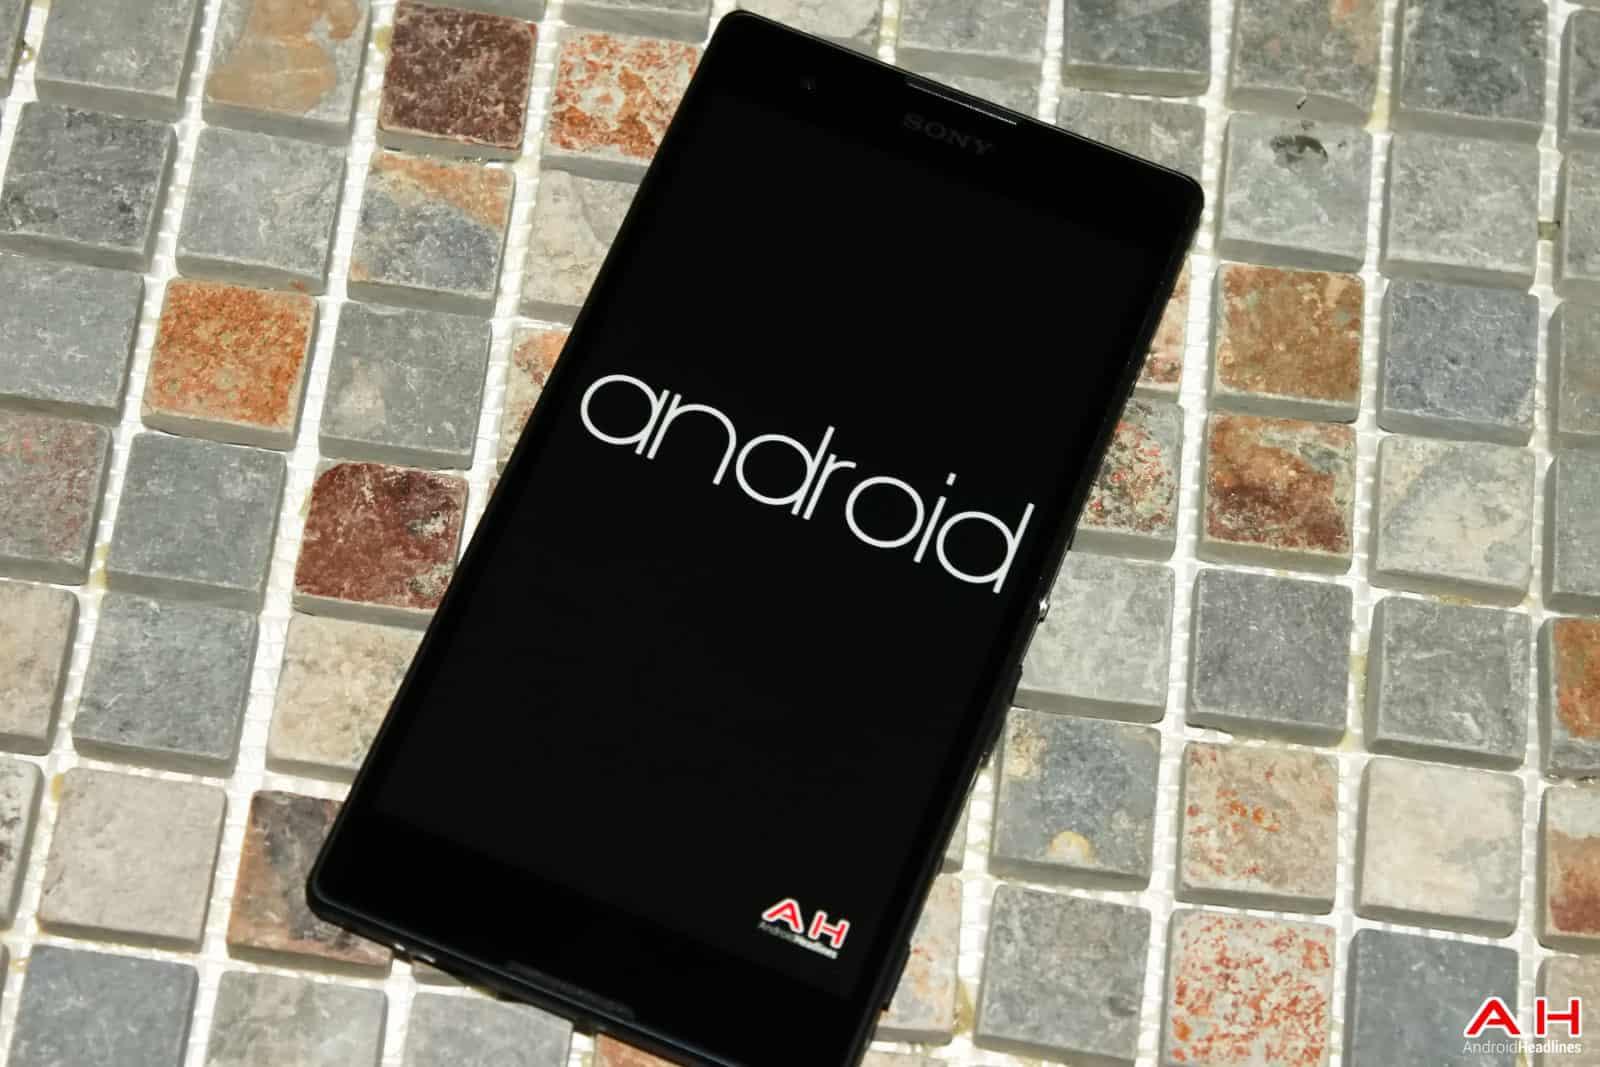 AH 2015 Android LOGO-179